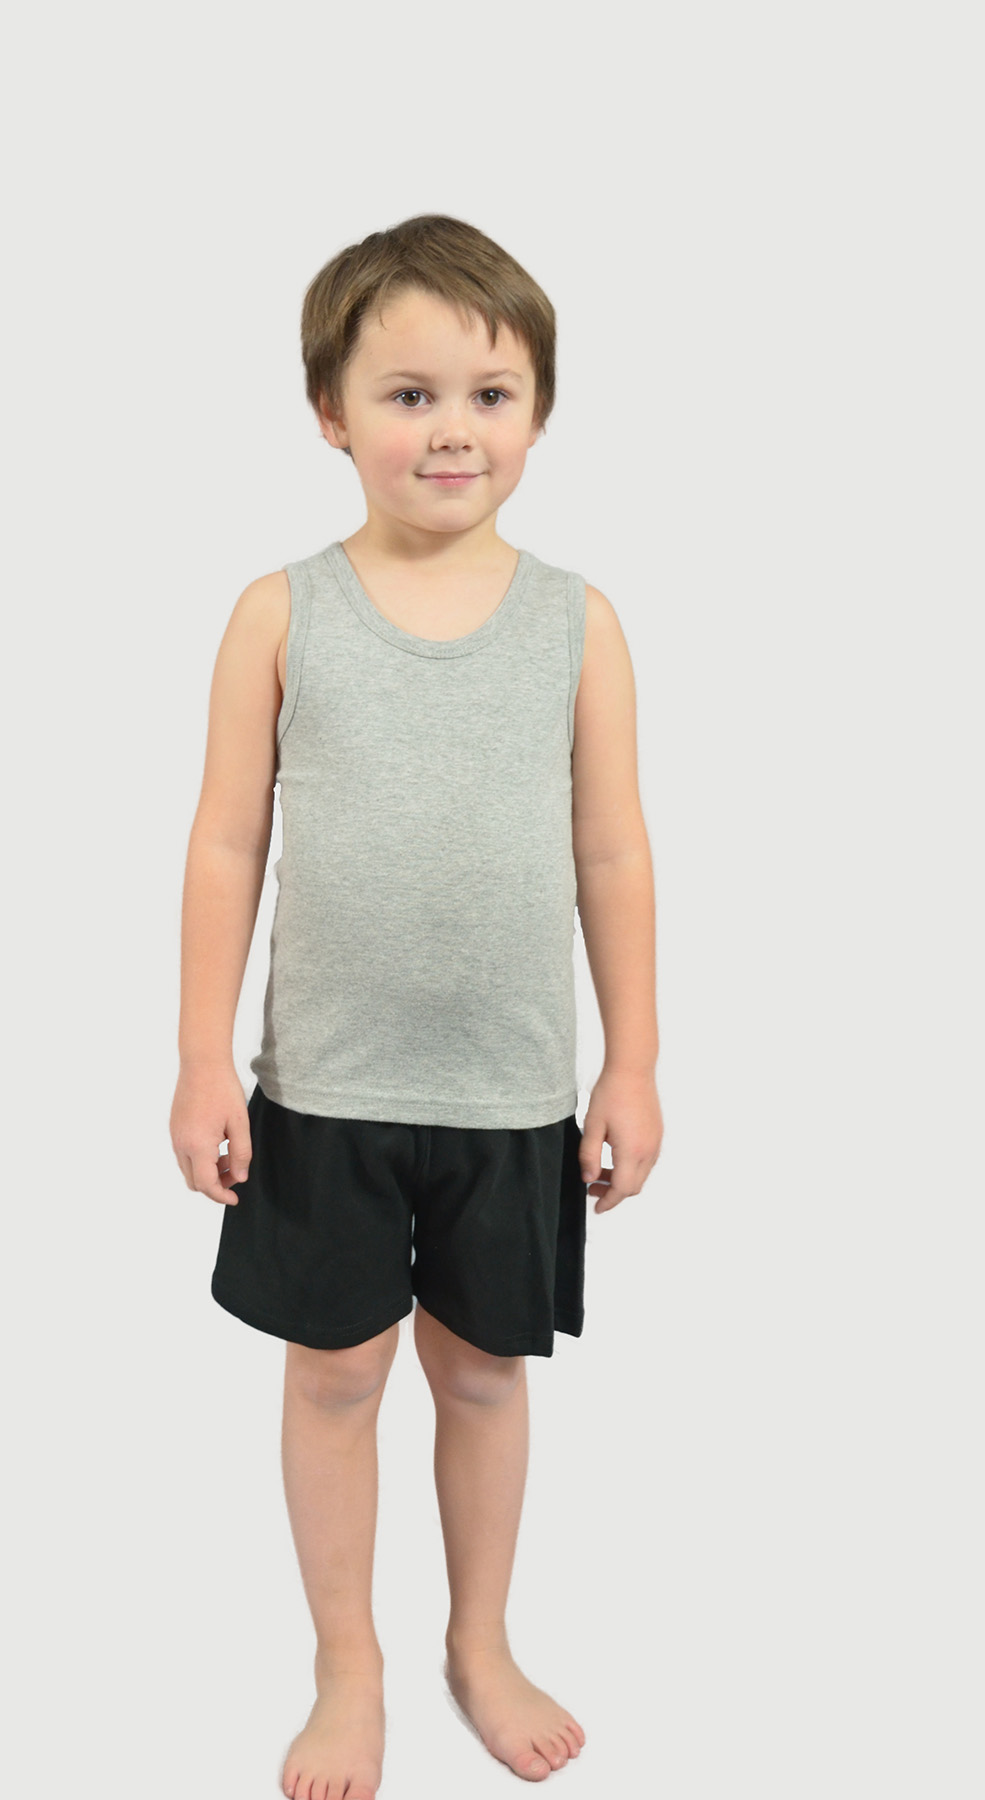 Monag 100324 - Drawsting Shorts